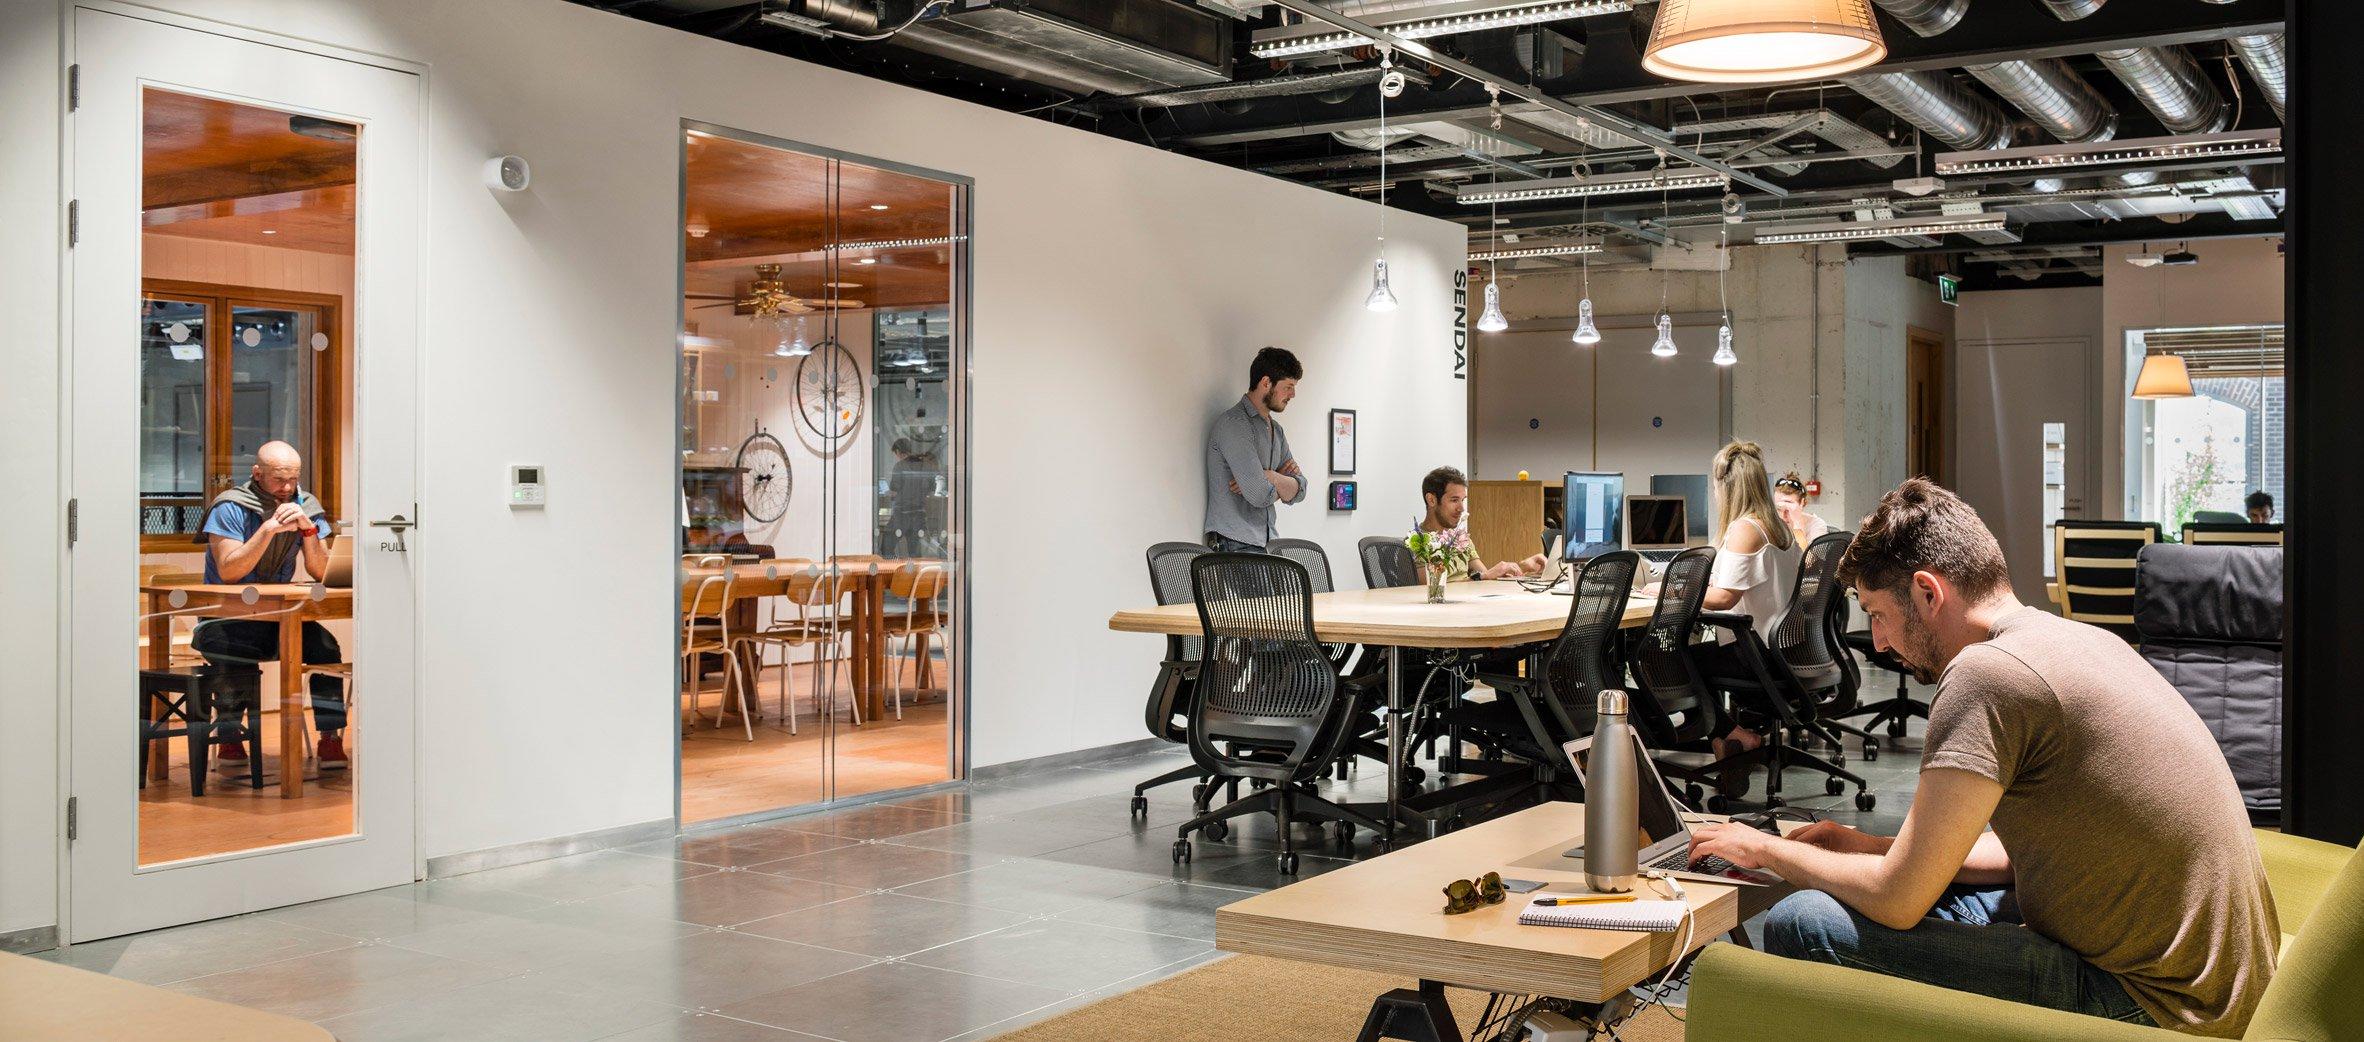 airbnb-dublin-office-interiors-ireland-offices_dezeen_2364_col_22